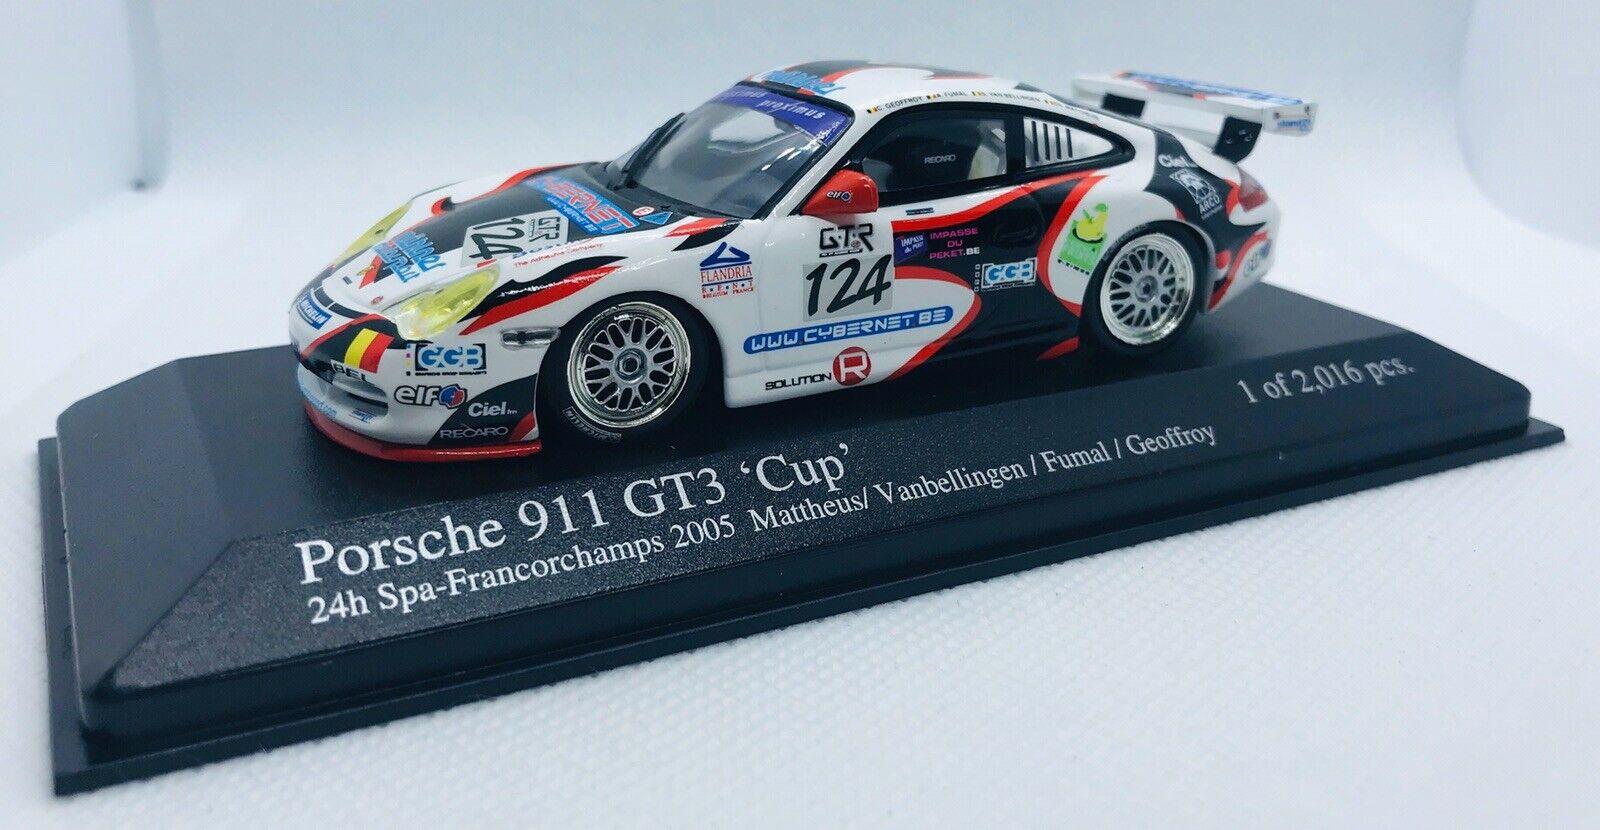 1 43 Porsche 911 Gt3 Rsr 2005 Spa 24hr 66 Minichamps 2112 Ltd Ed For Sale Online Ebay